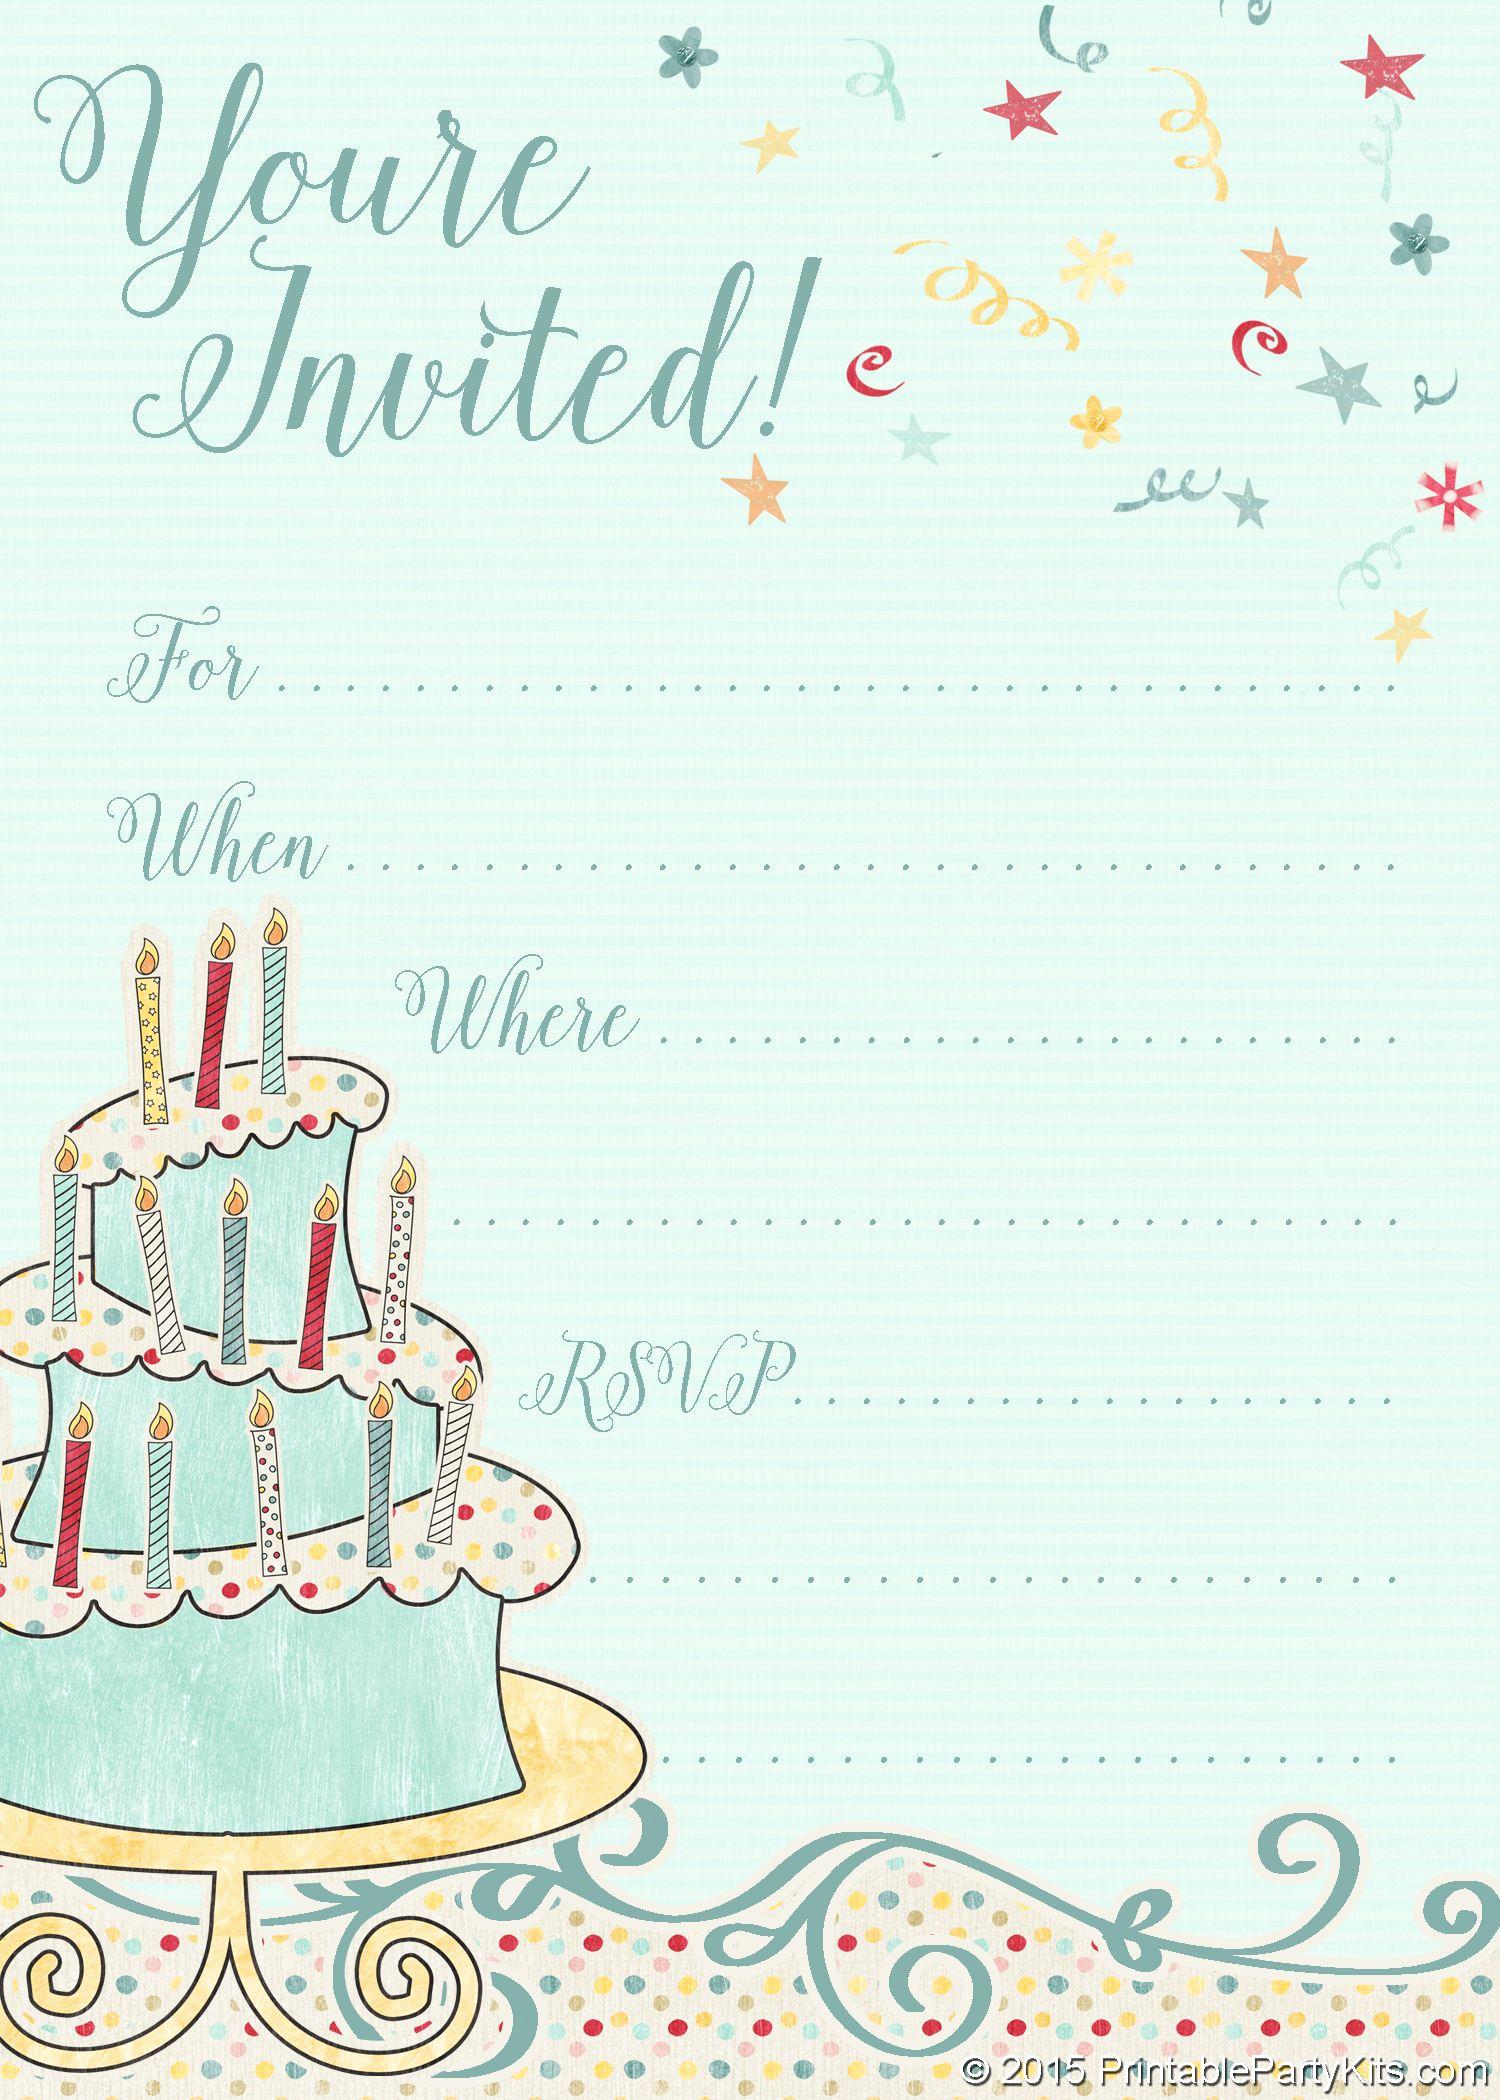 Free Anniversary Invitation Templates Elegant Free Printable Whimsical Birthday Party Invitation